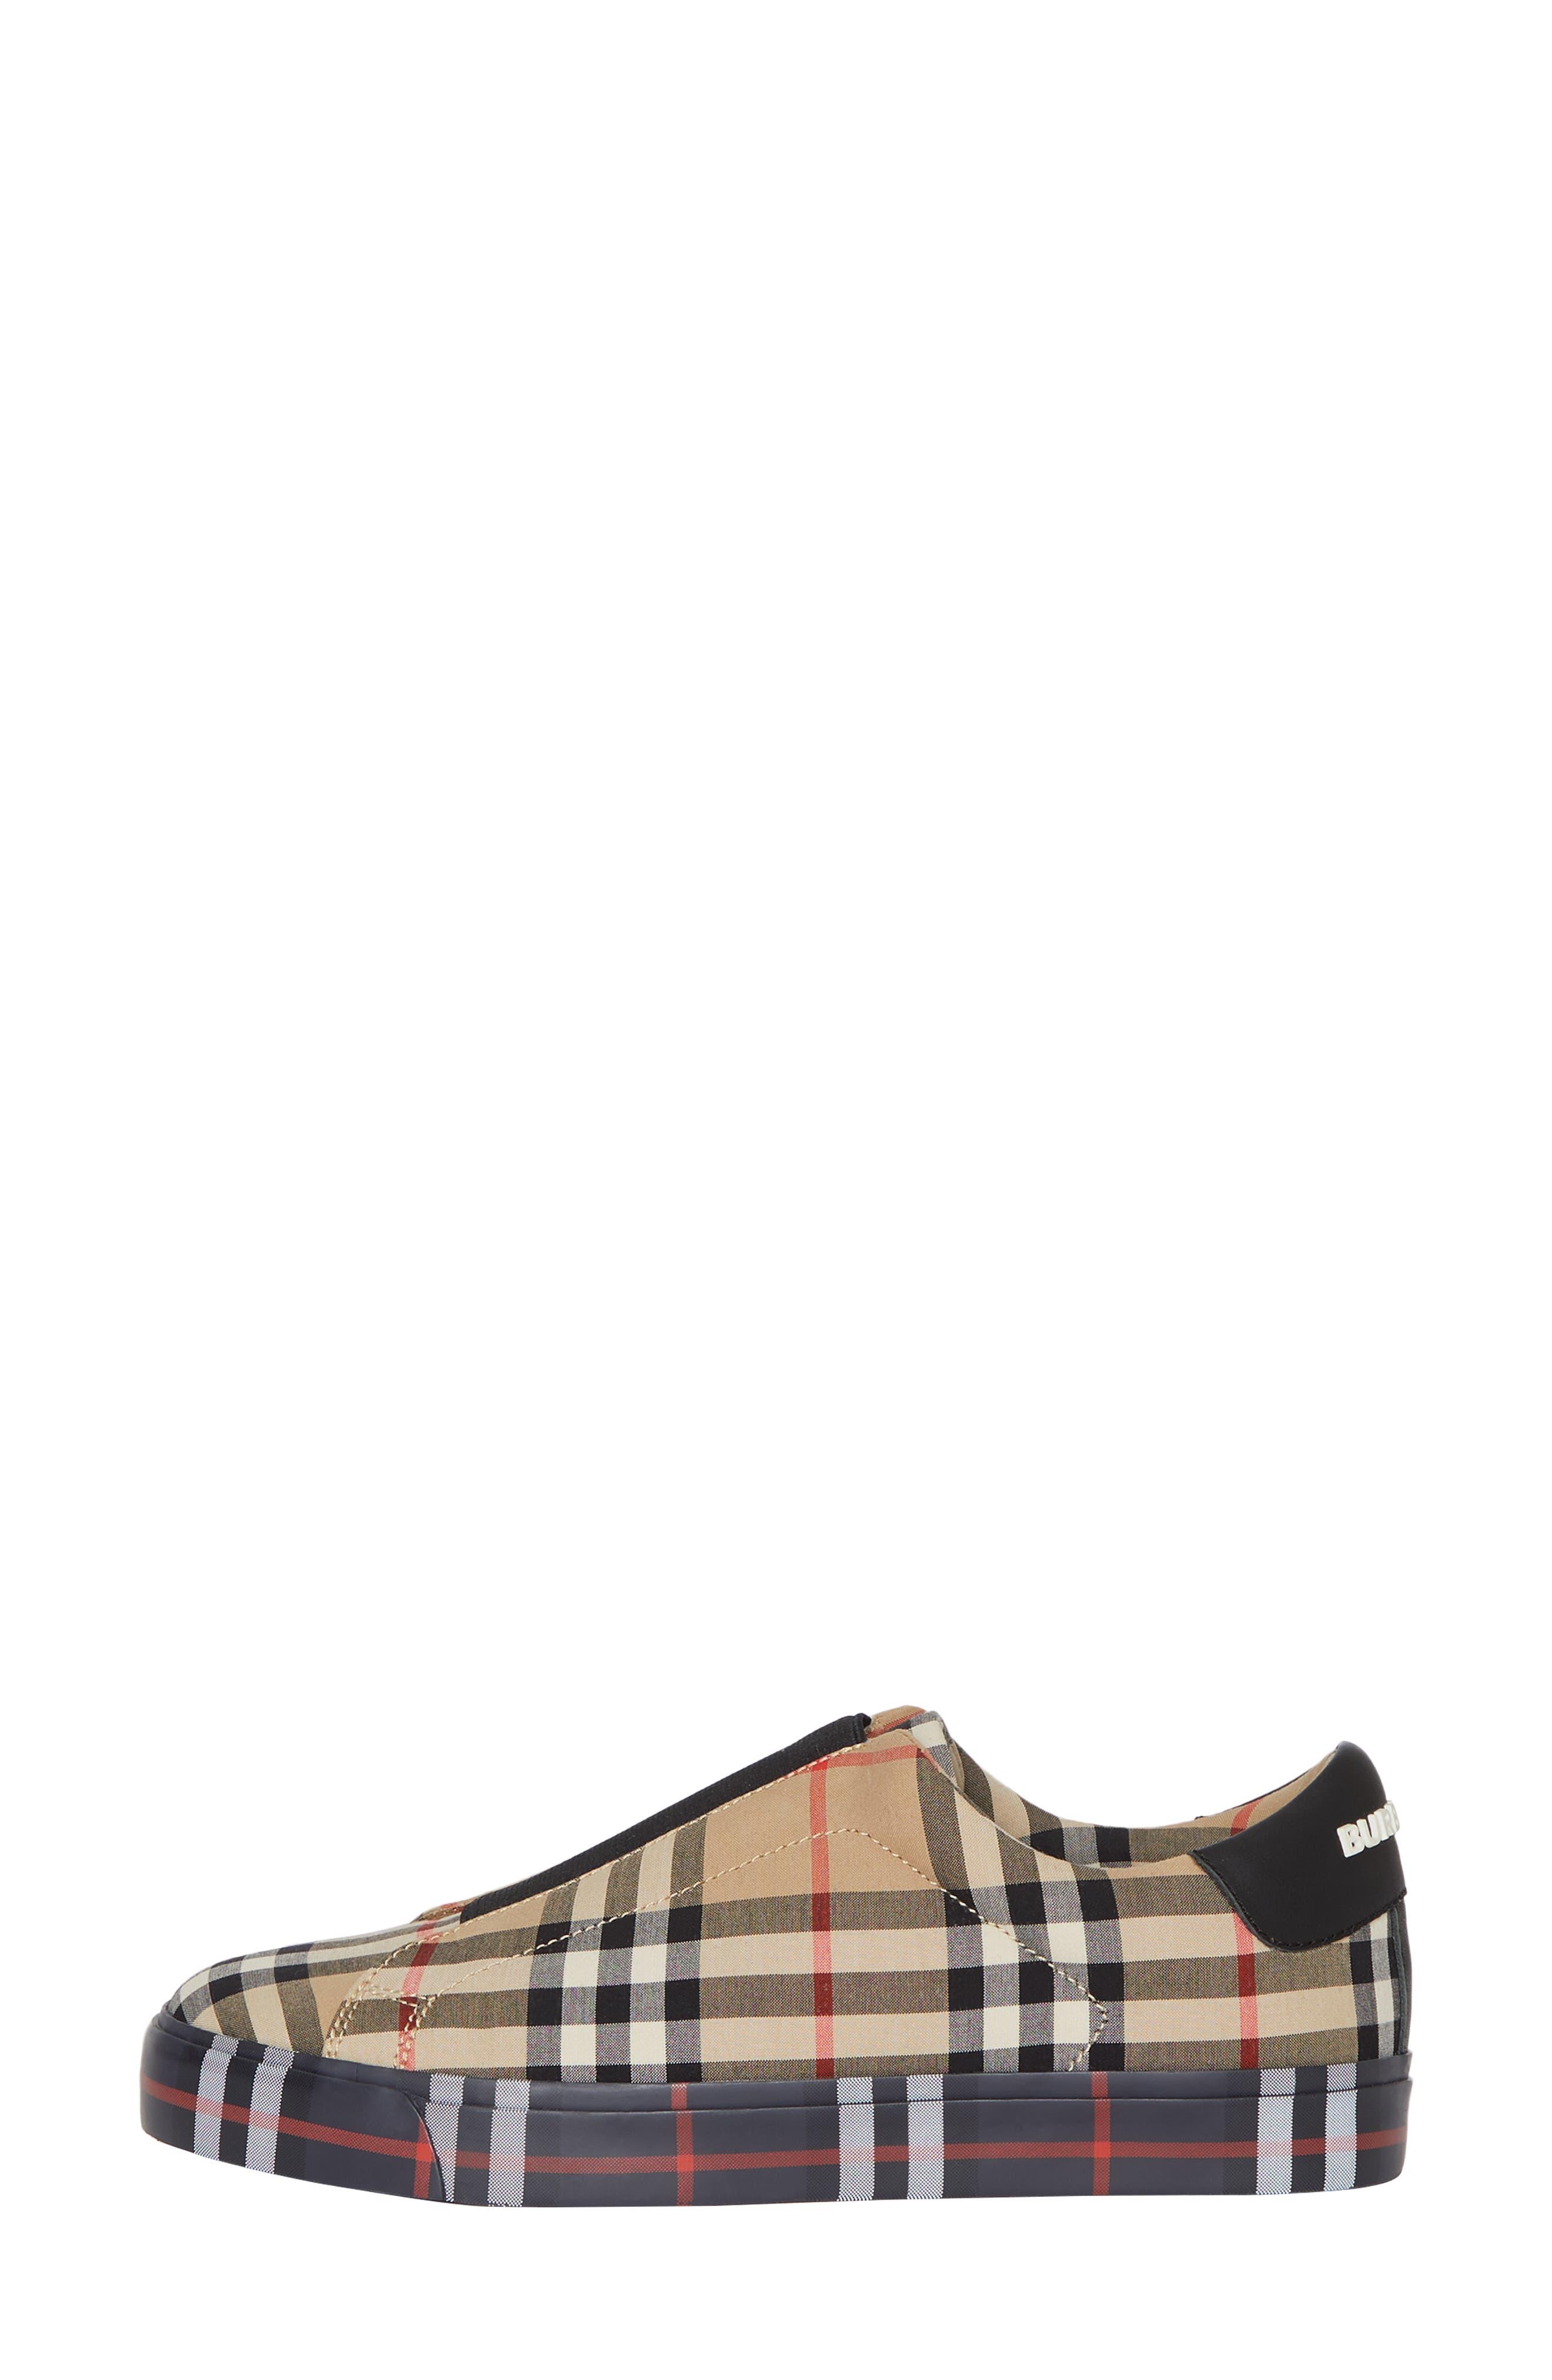 BURBERRY, Markham Vintage Check Slip-On Sneaker, Alternate thumbnail 9, color, BEIGE PLAID